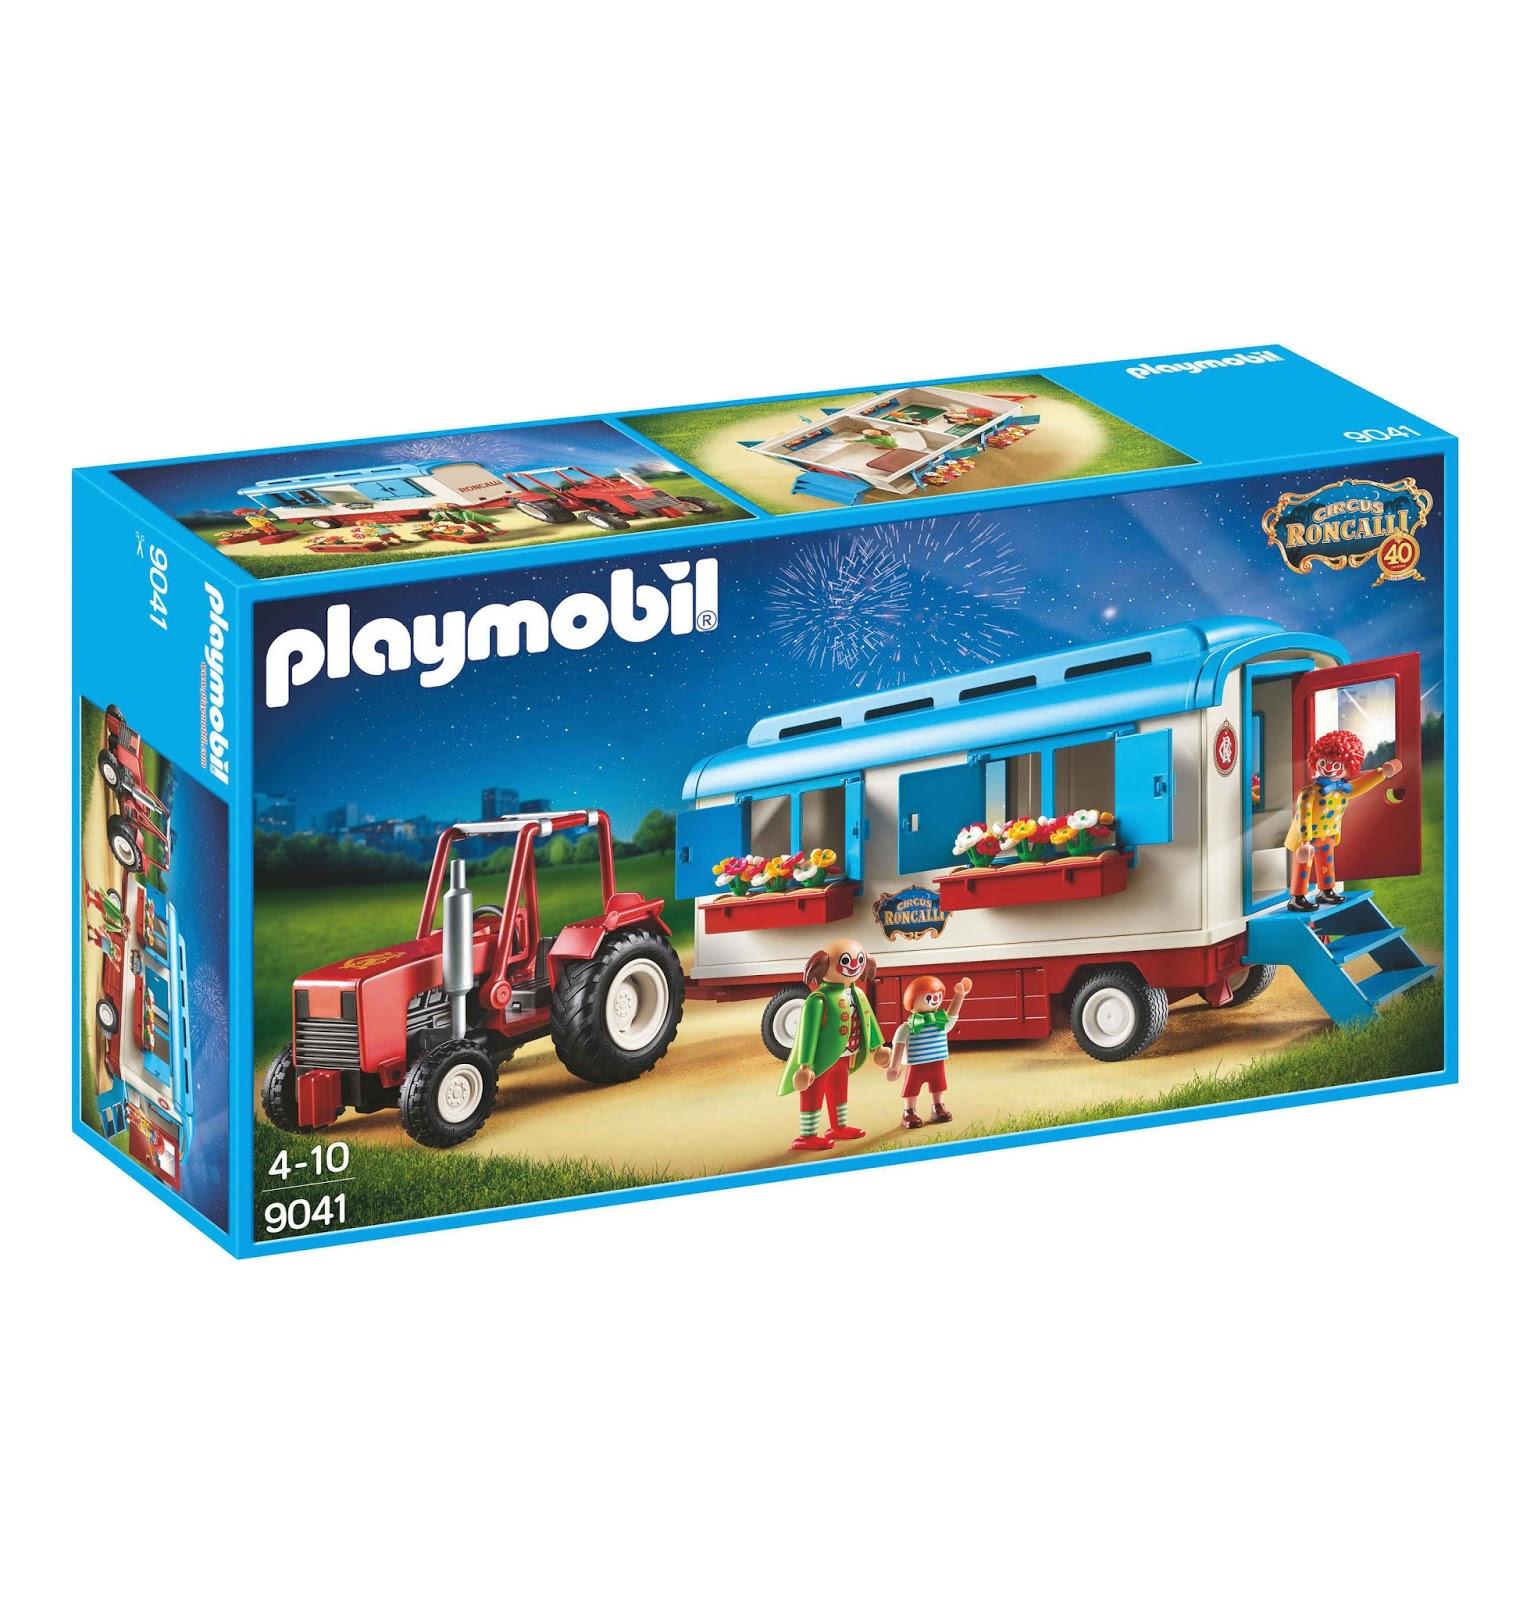 Nuevo circo roncalli playmobil for Autocaravana playmobil